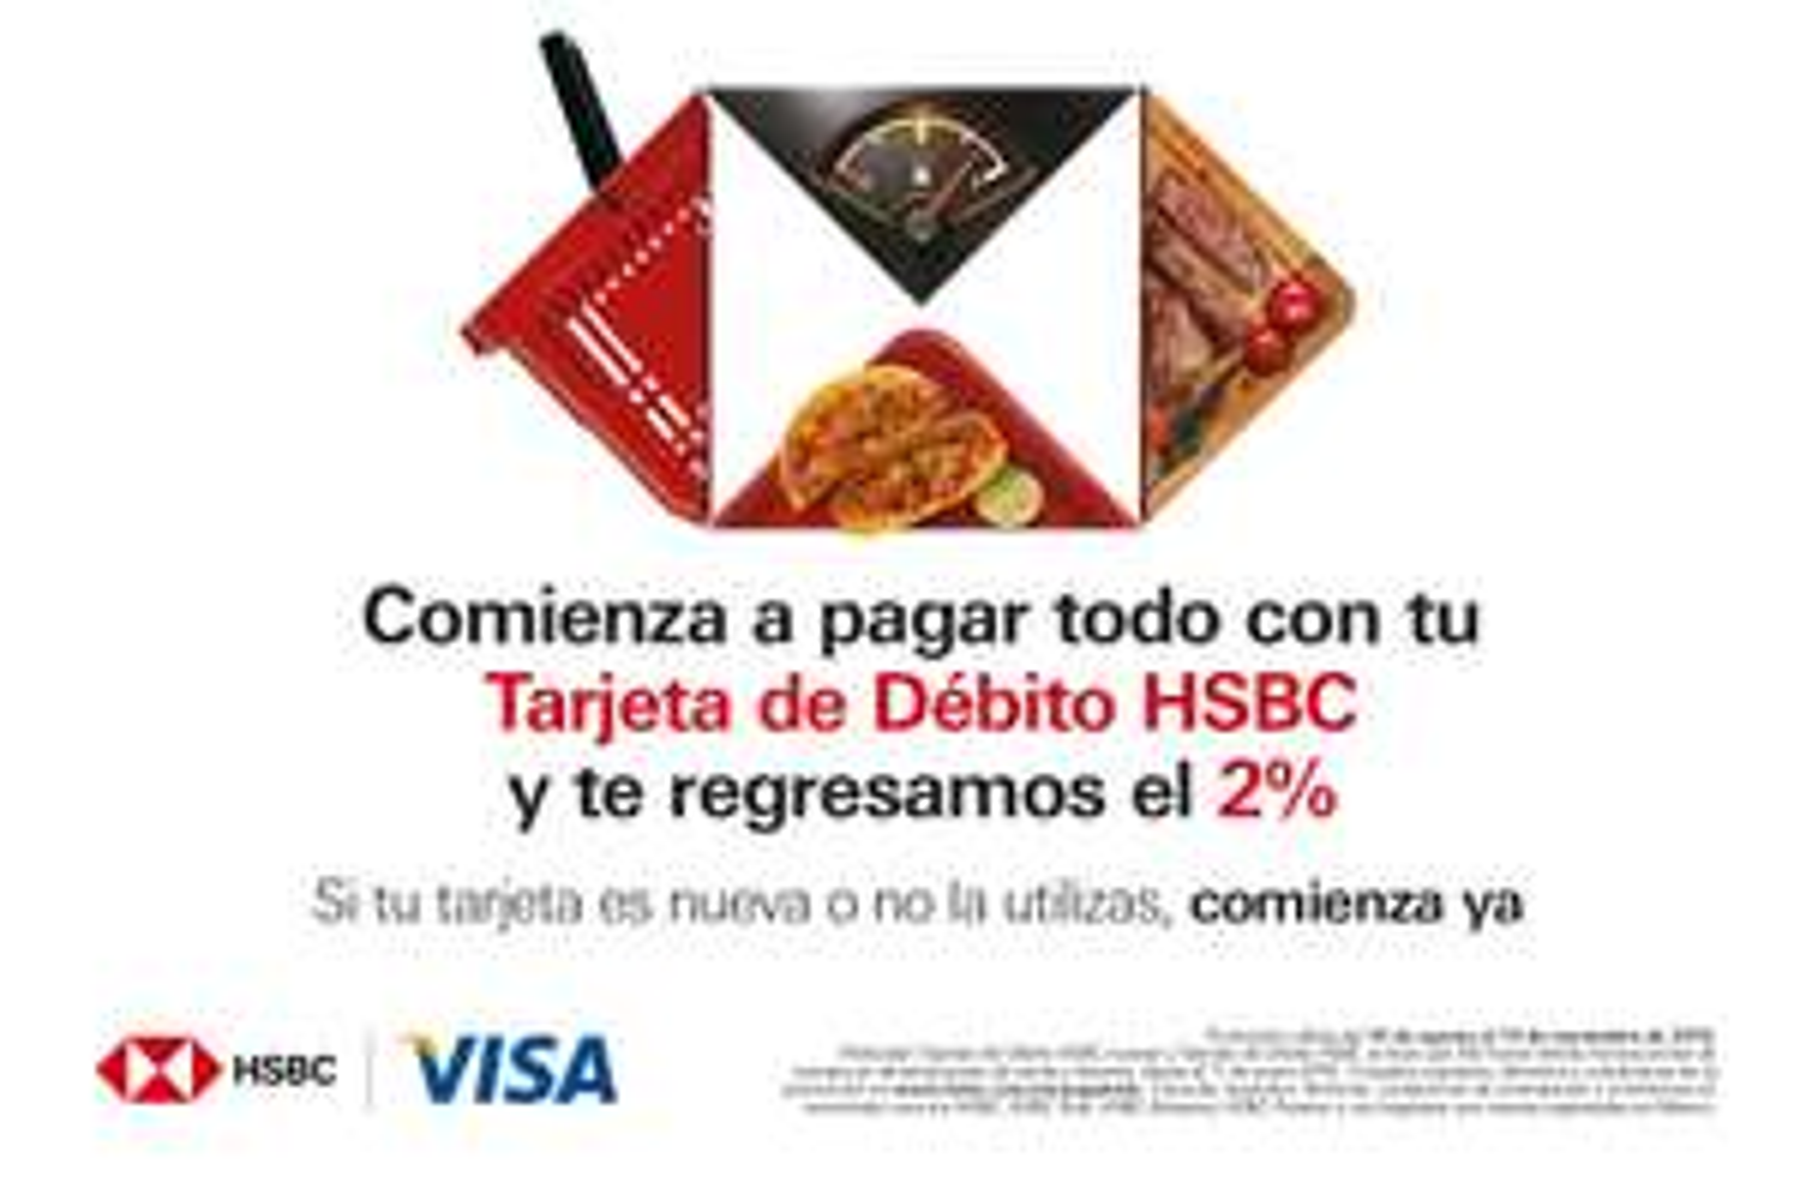 HSBC: 2% Reembolso con tarjetas de débito.